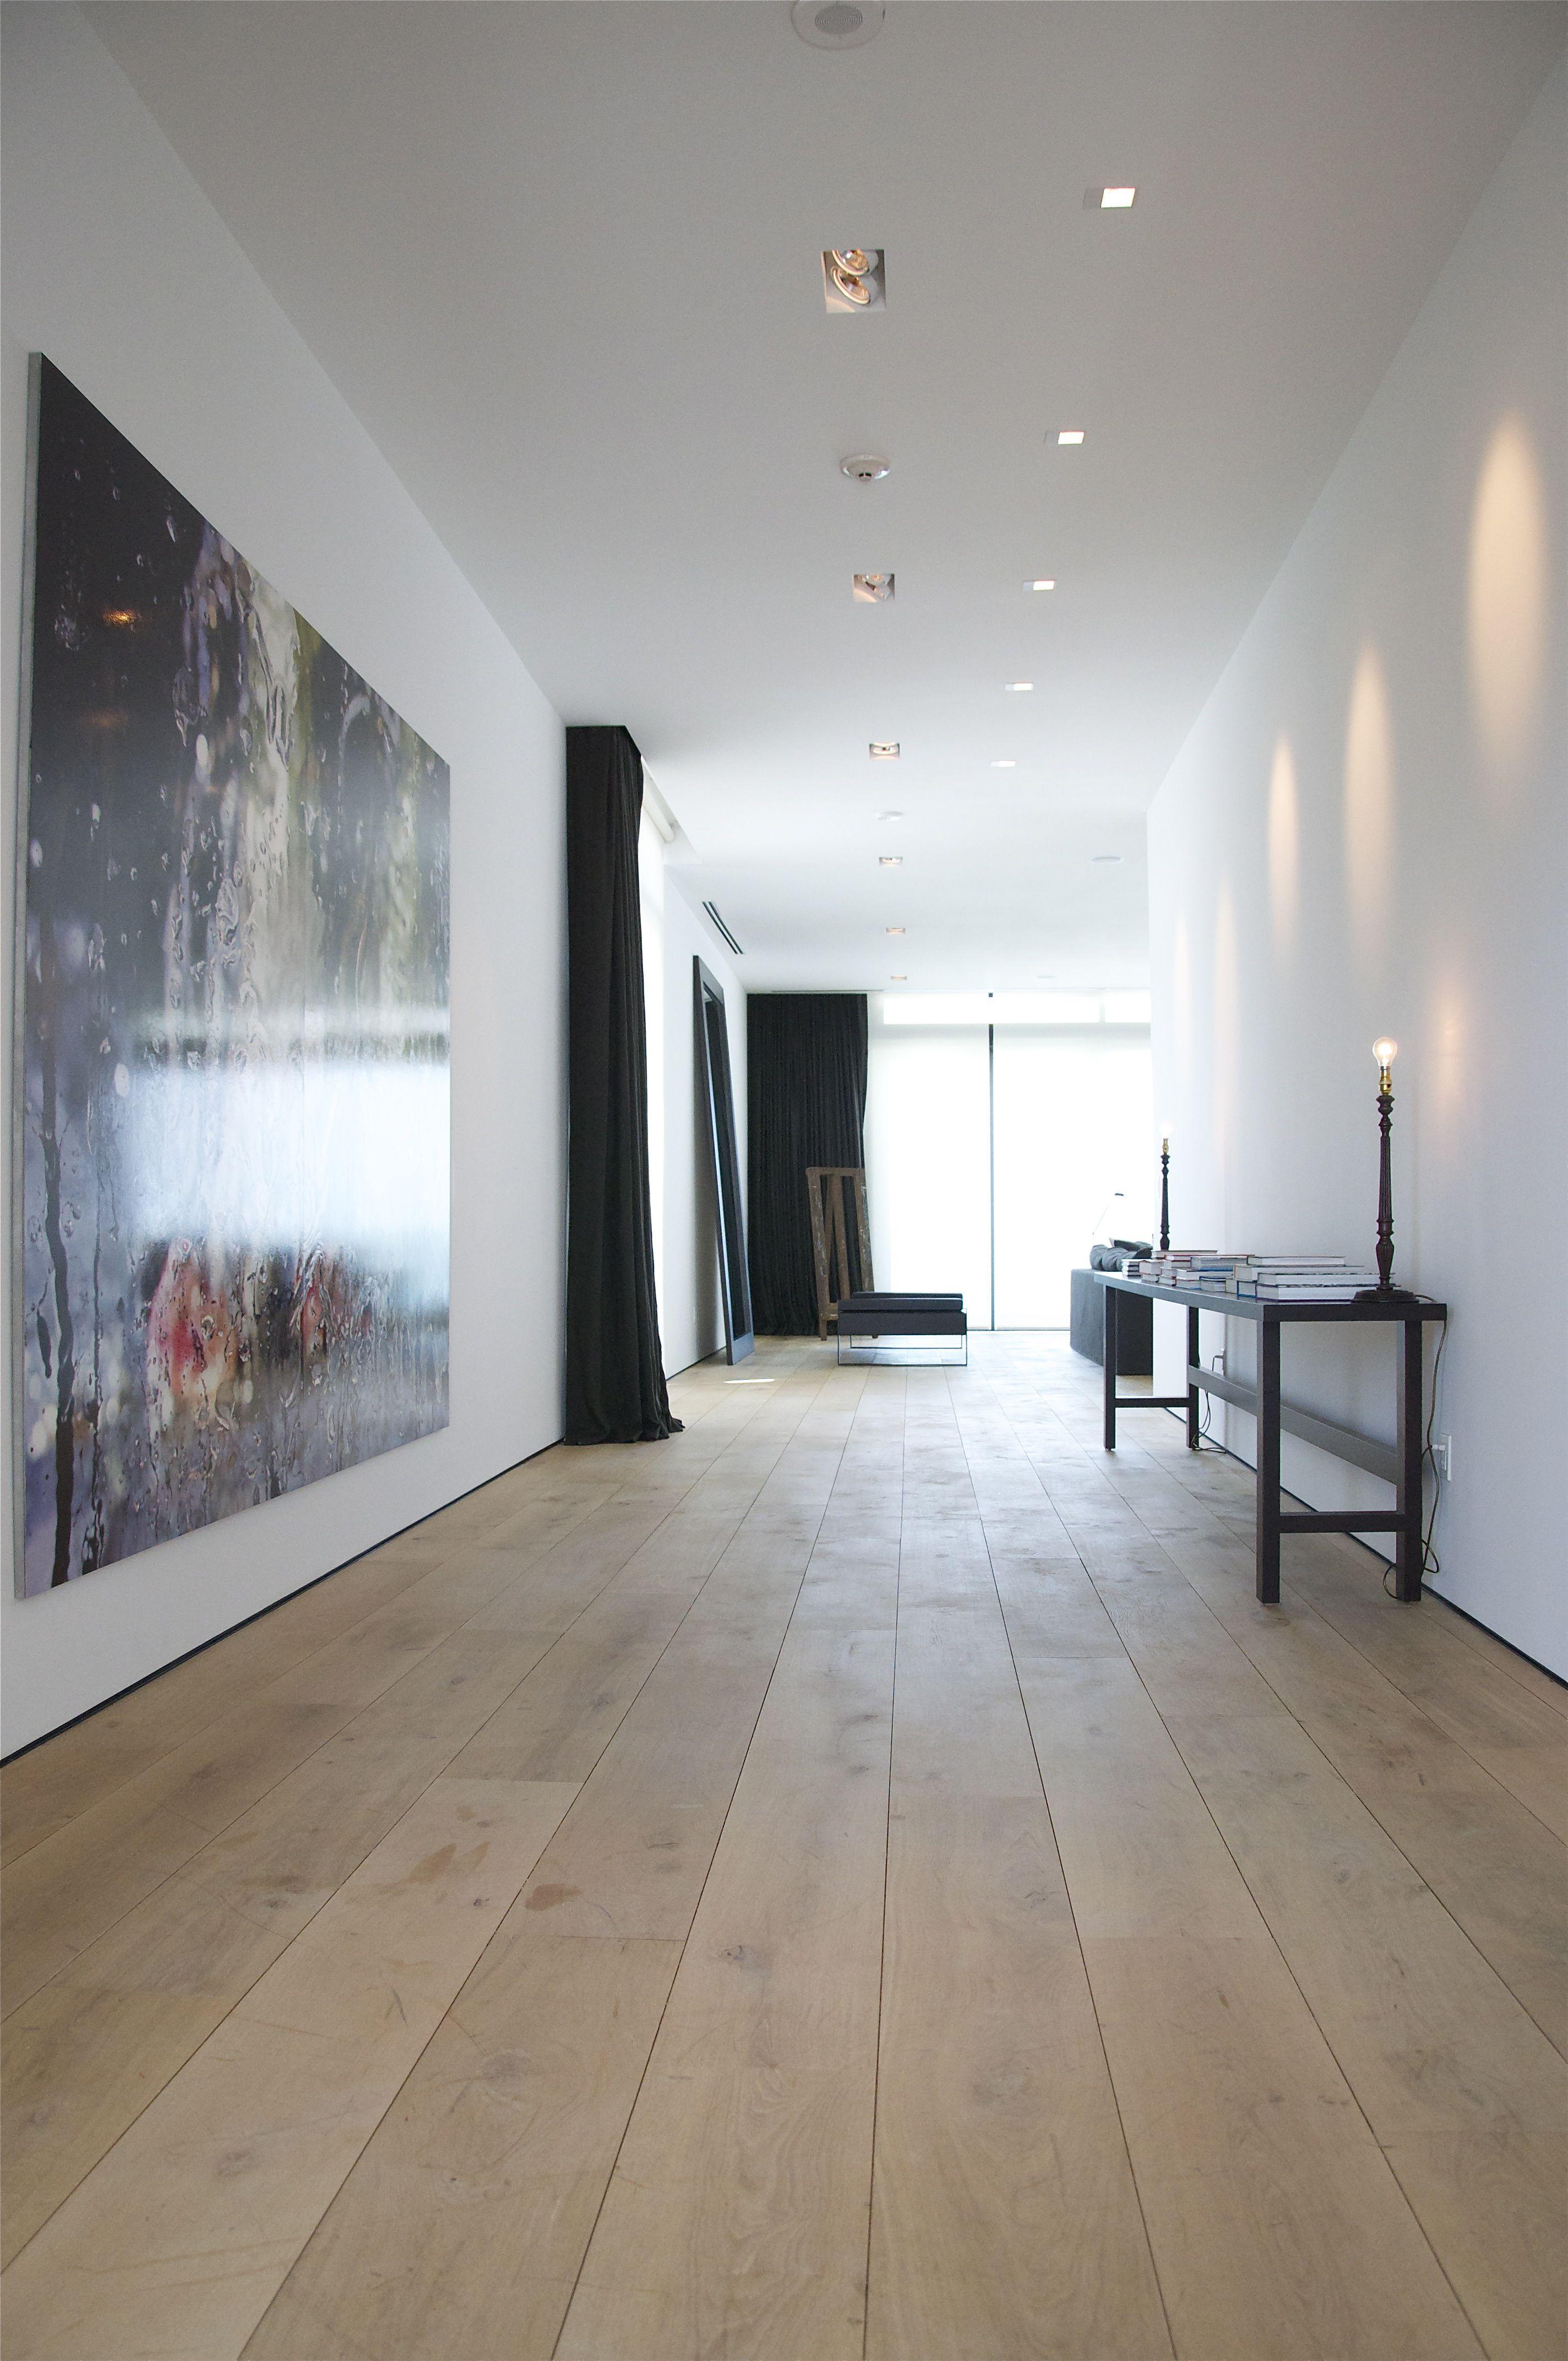 GOOD bones...wide plank wood flooring...space....art...& fabulous lighting.....gimme some...please <3